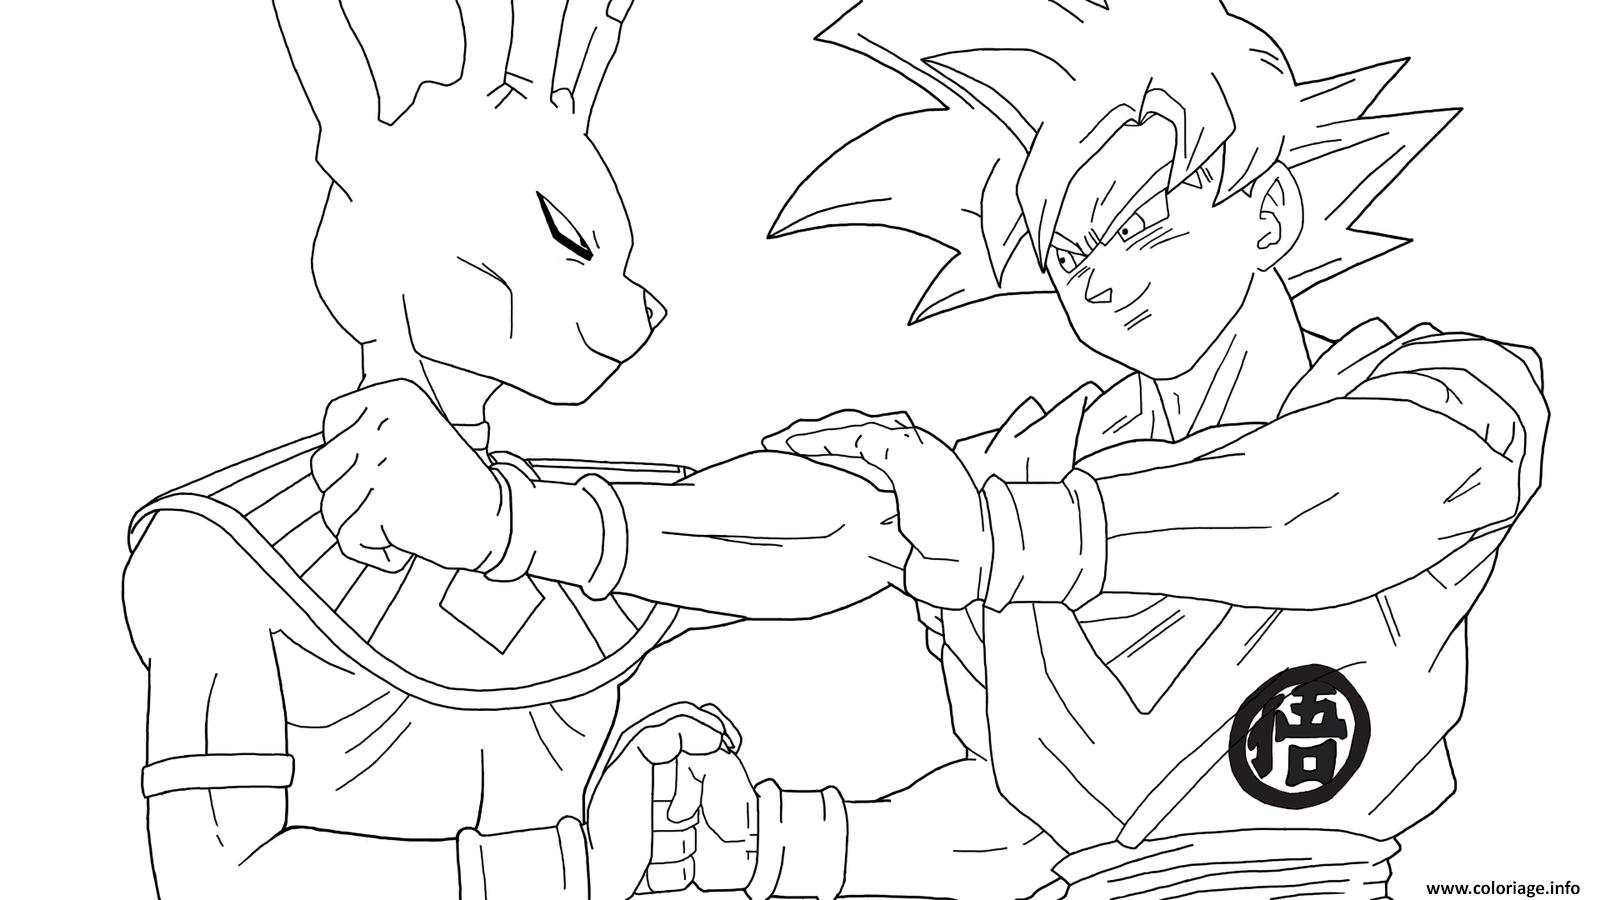 Coloriage Beerus Vs Goku Super Saiyan Gold Dbz Jecolorie Com